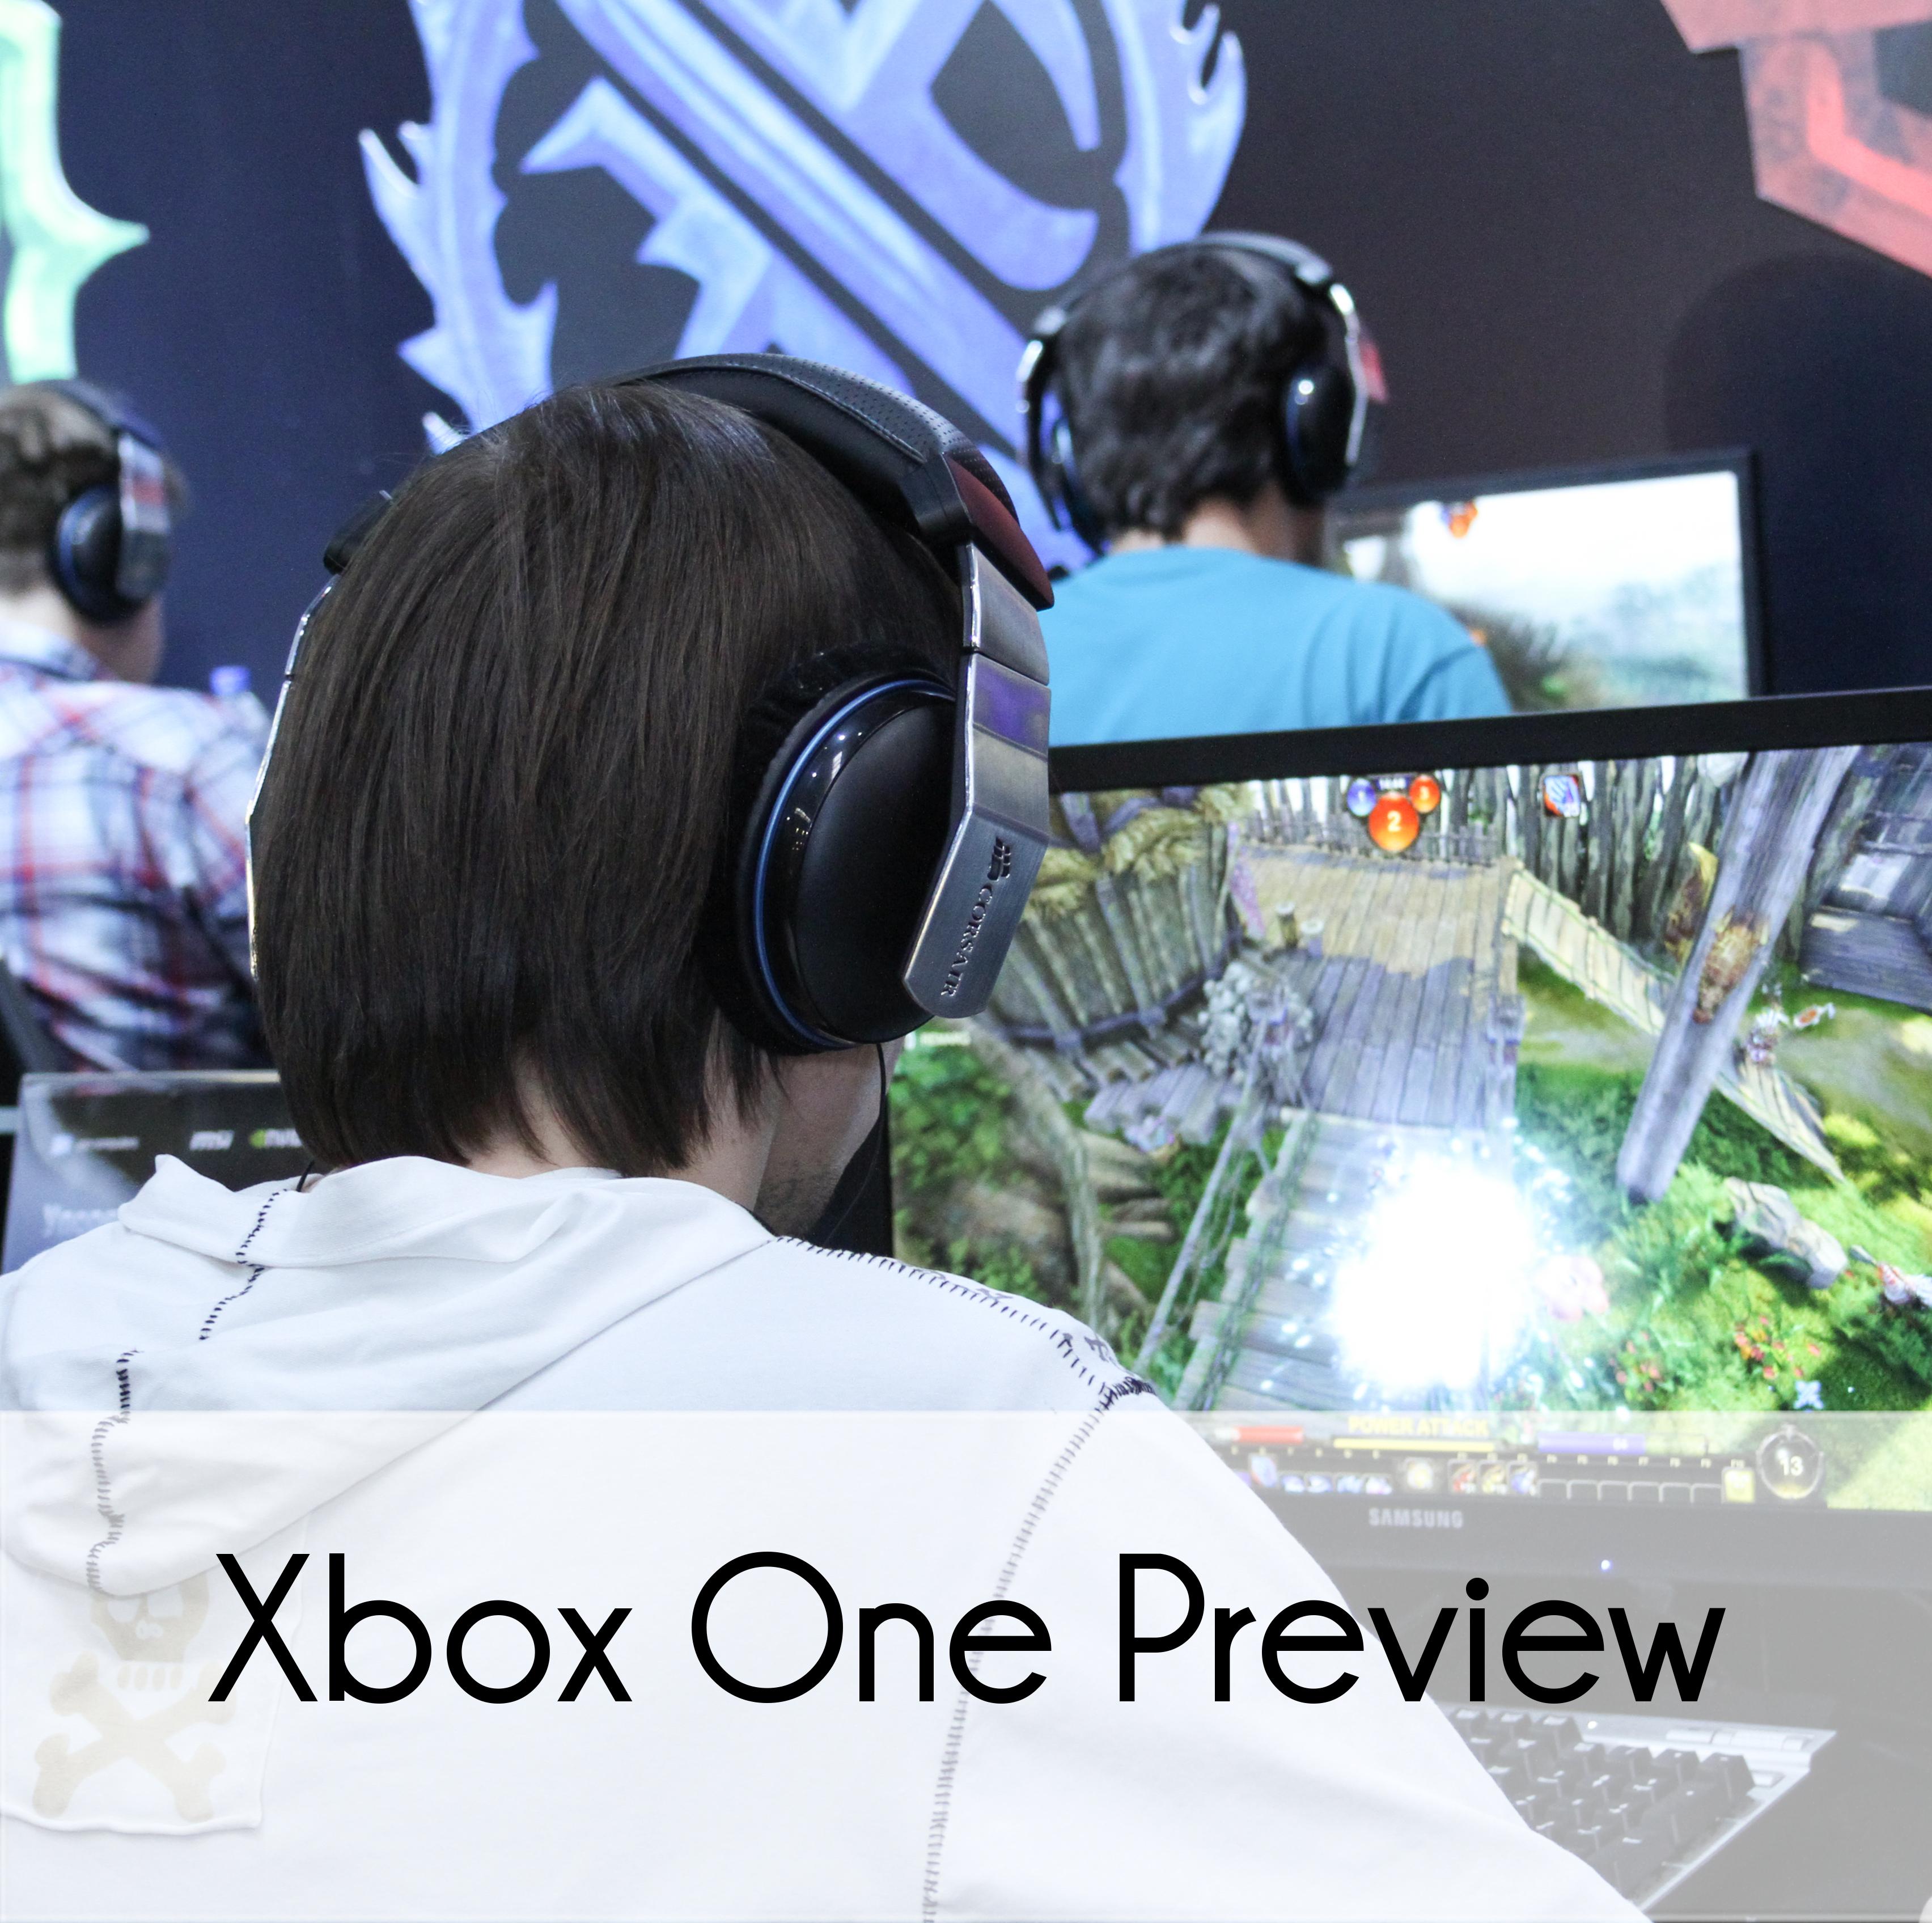 Microsoft Announces Xbox One to Replace Xbox 360